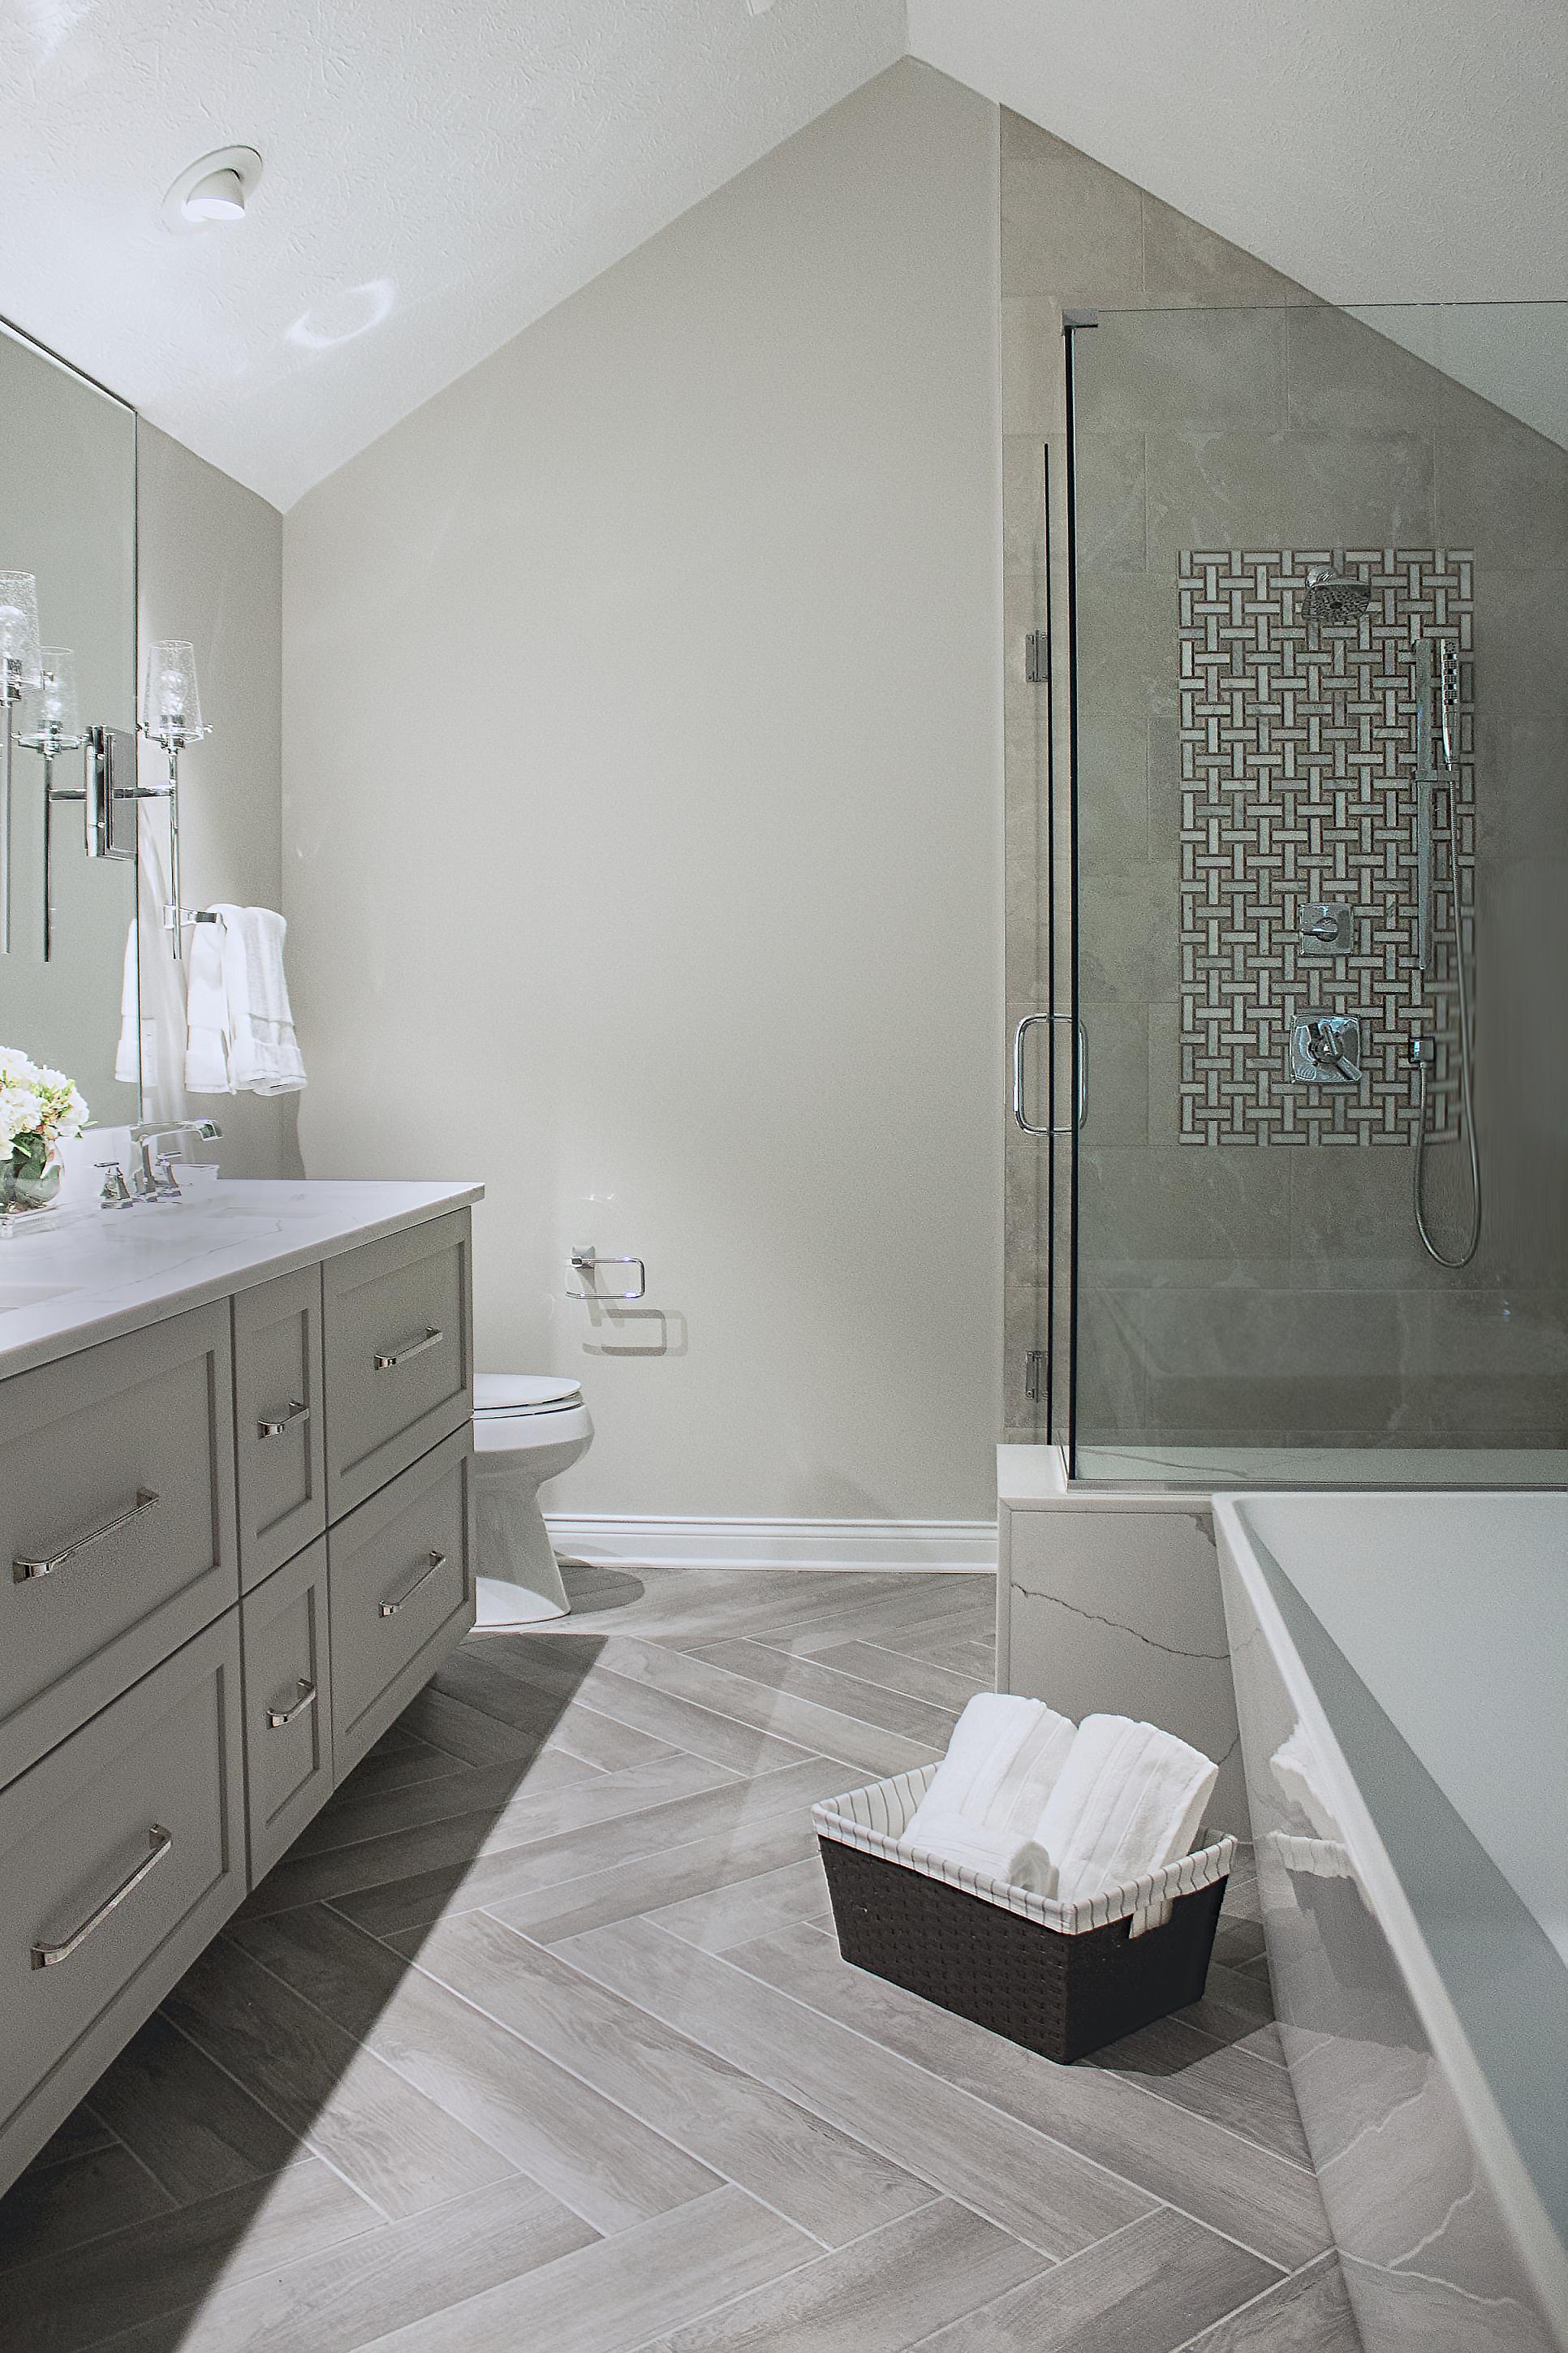 Jones Kitchen Remodel Indianapolis With Images Bathroom